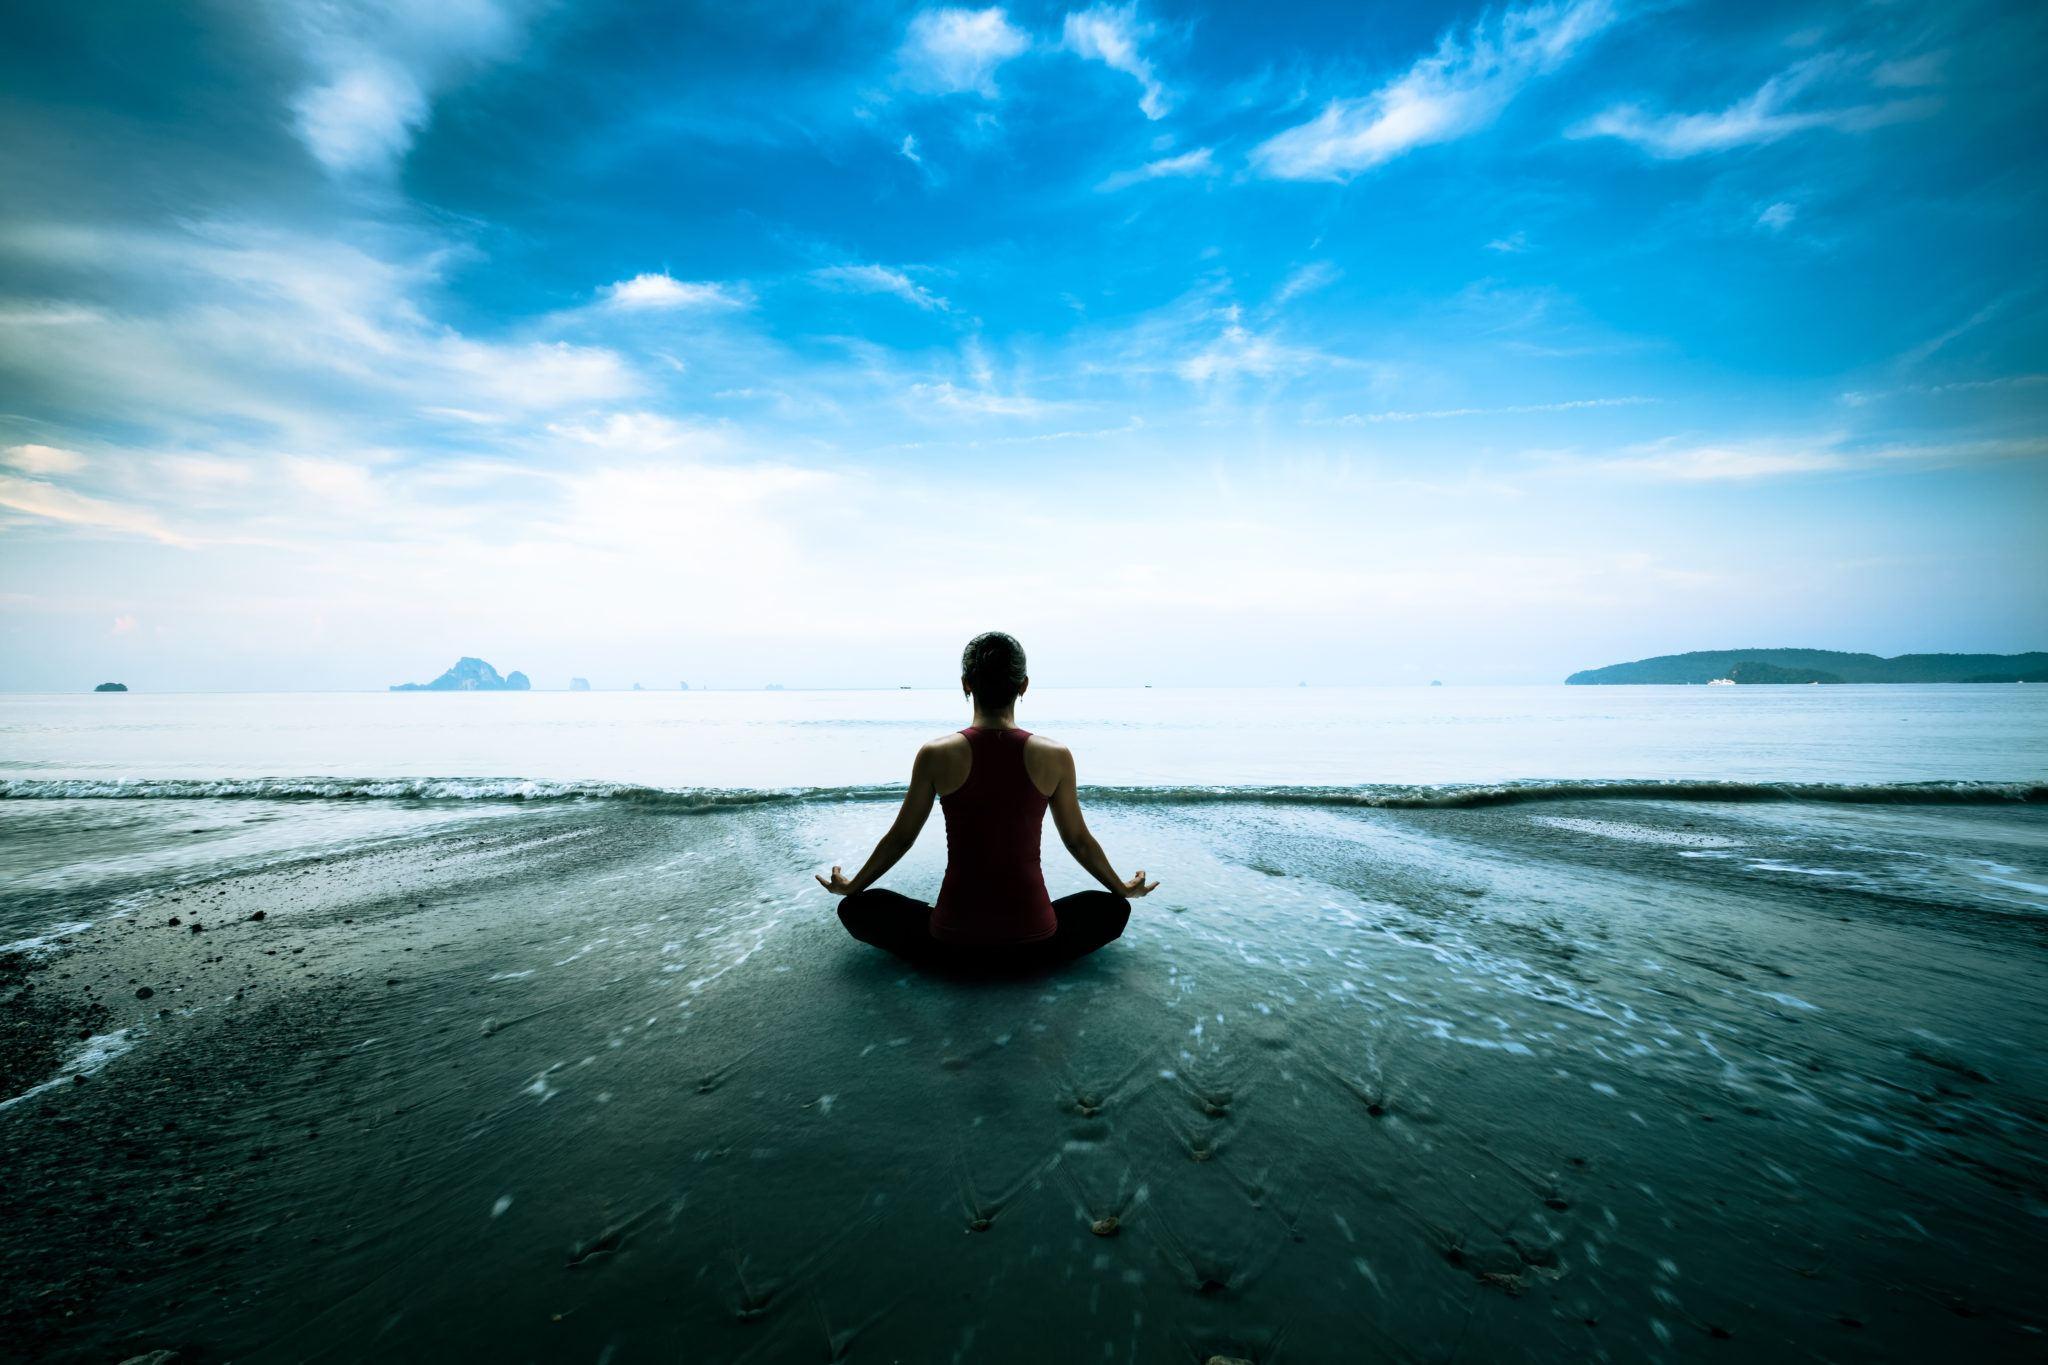 Meditation visualization